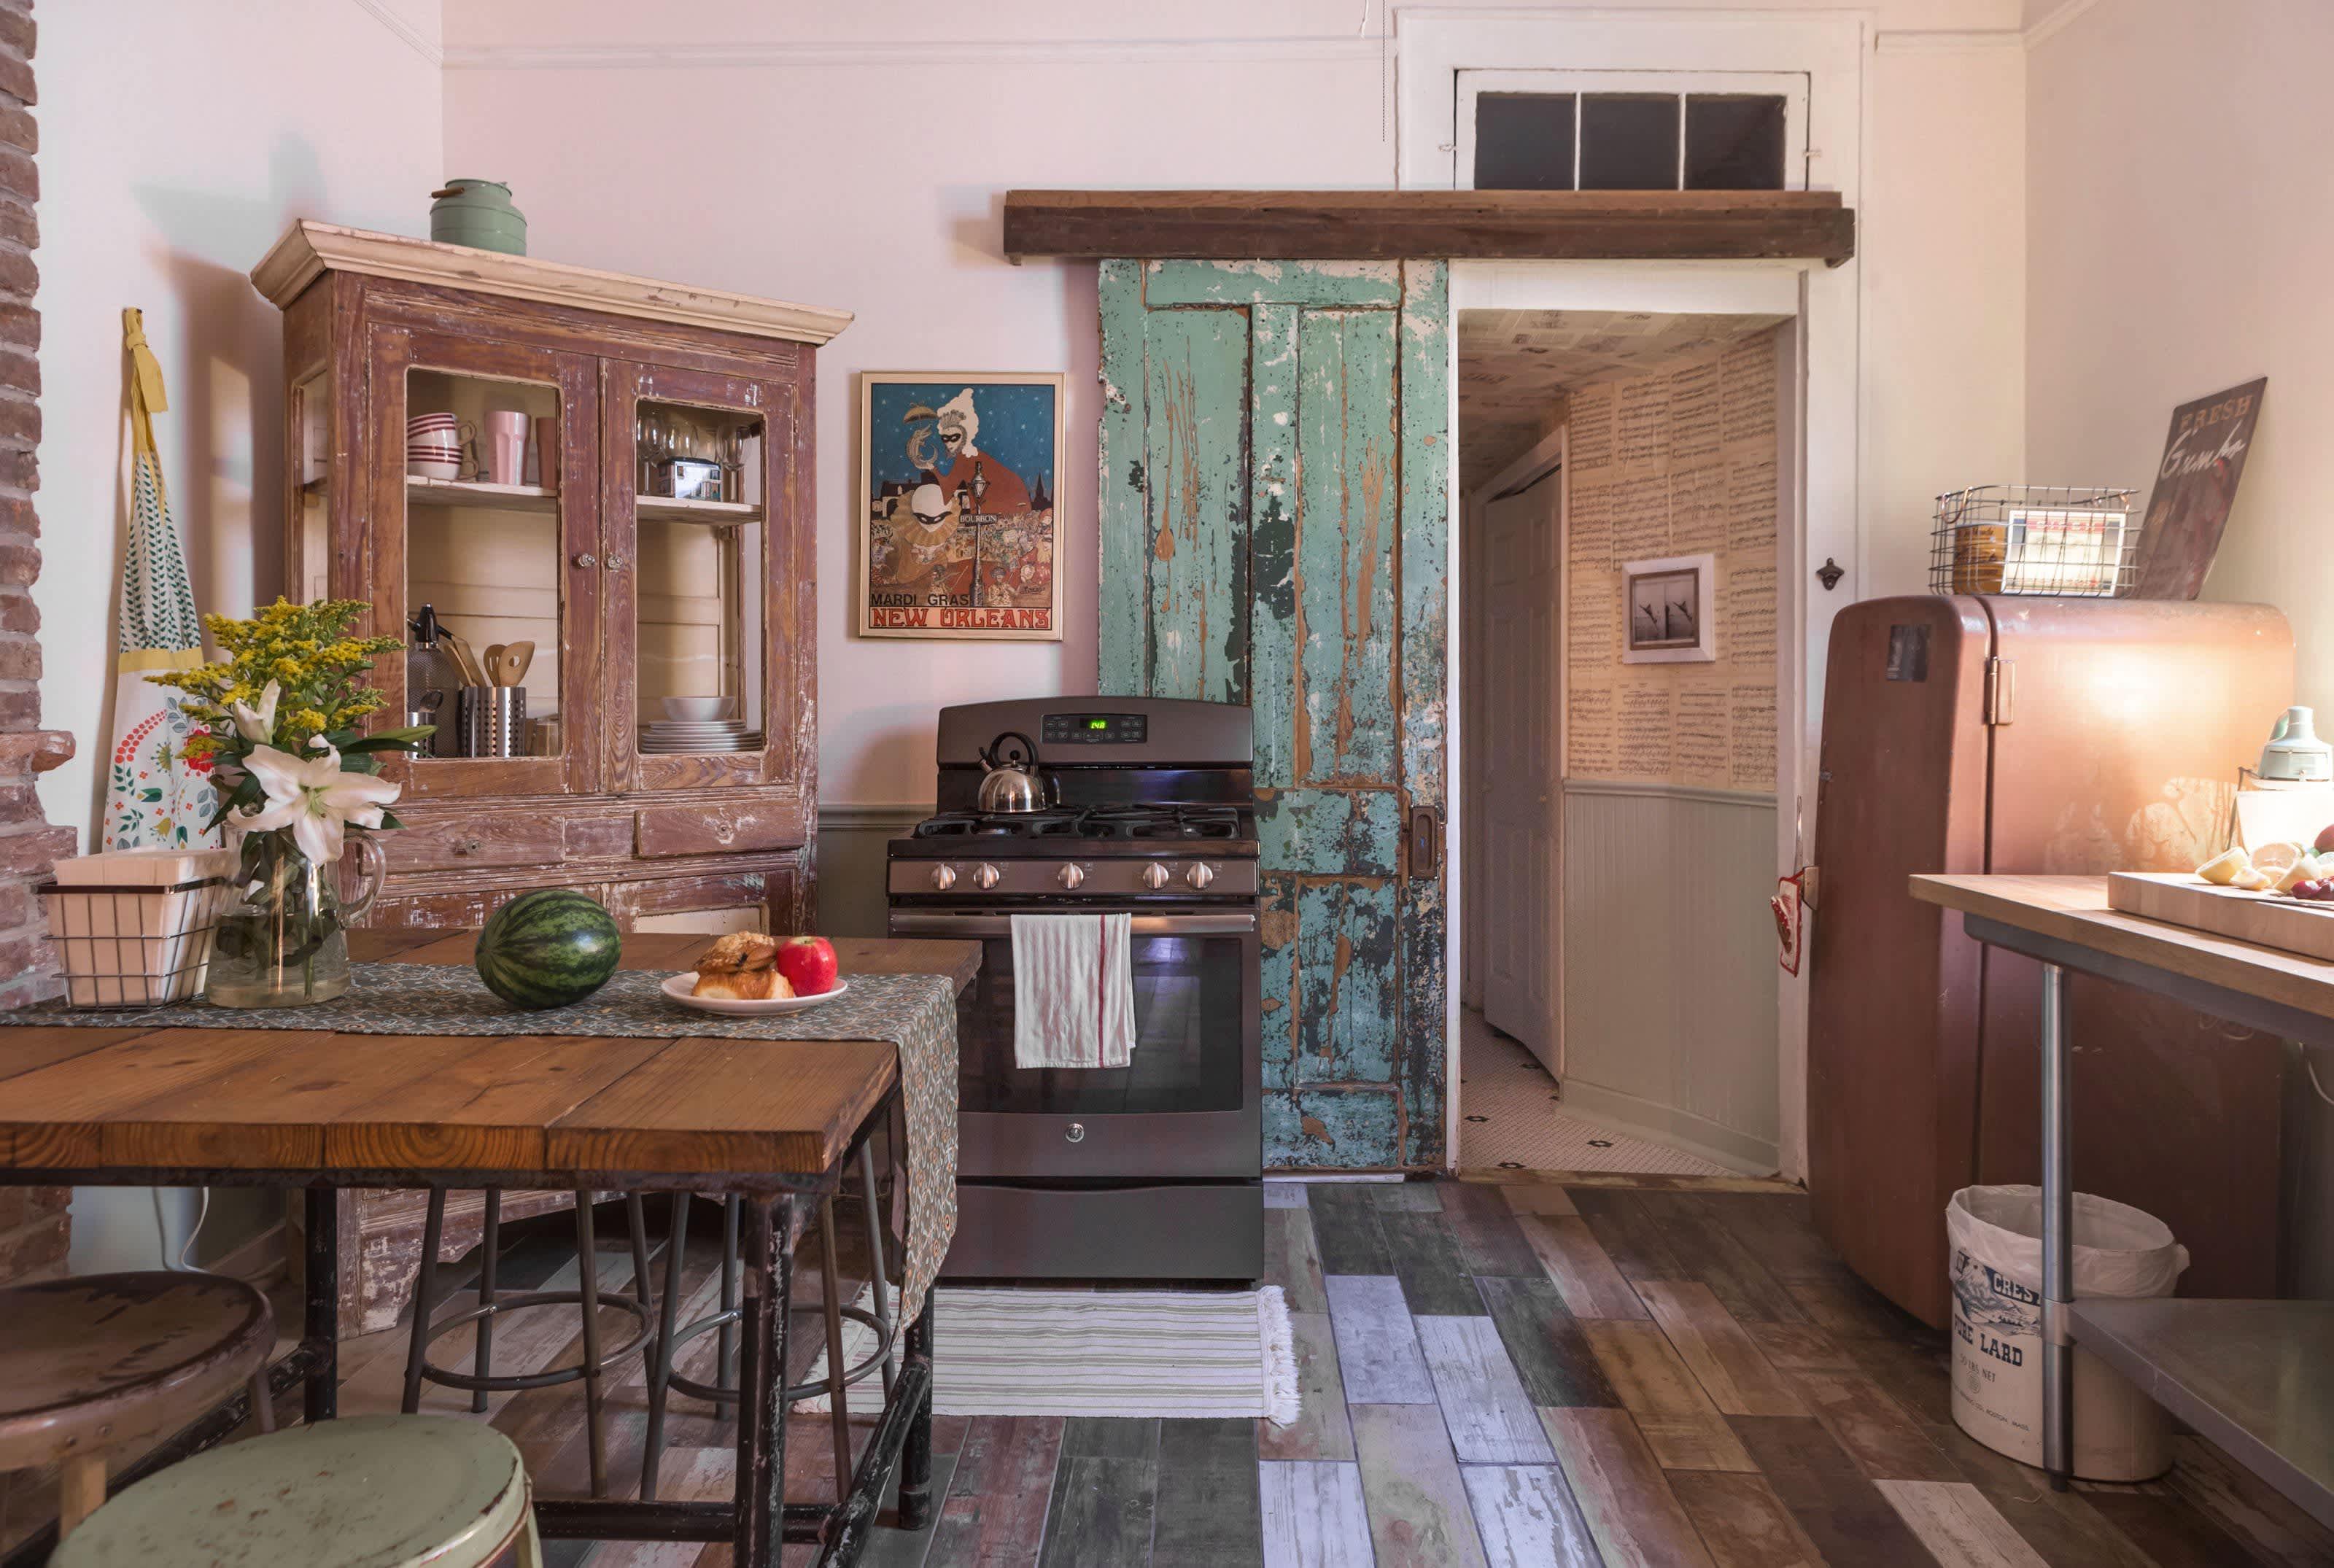 House Tour: A New Orleans Shotgun With Vintage Charm